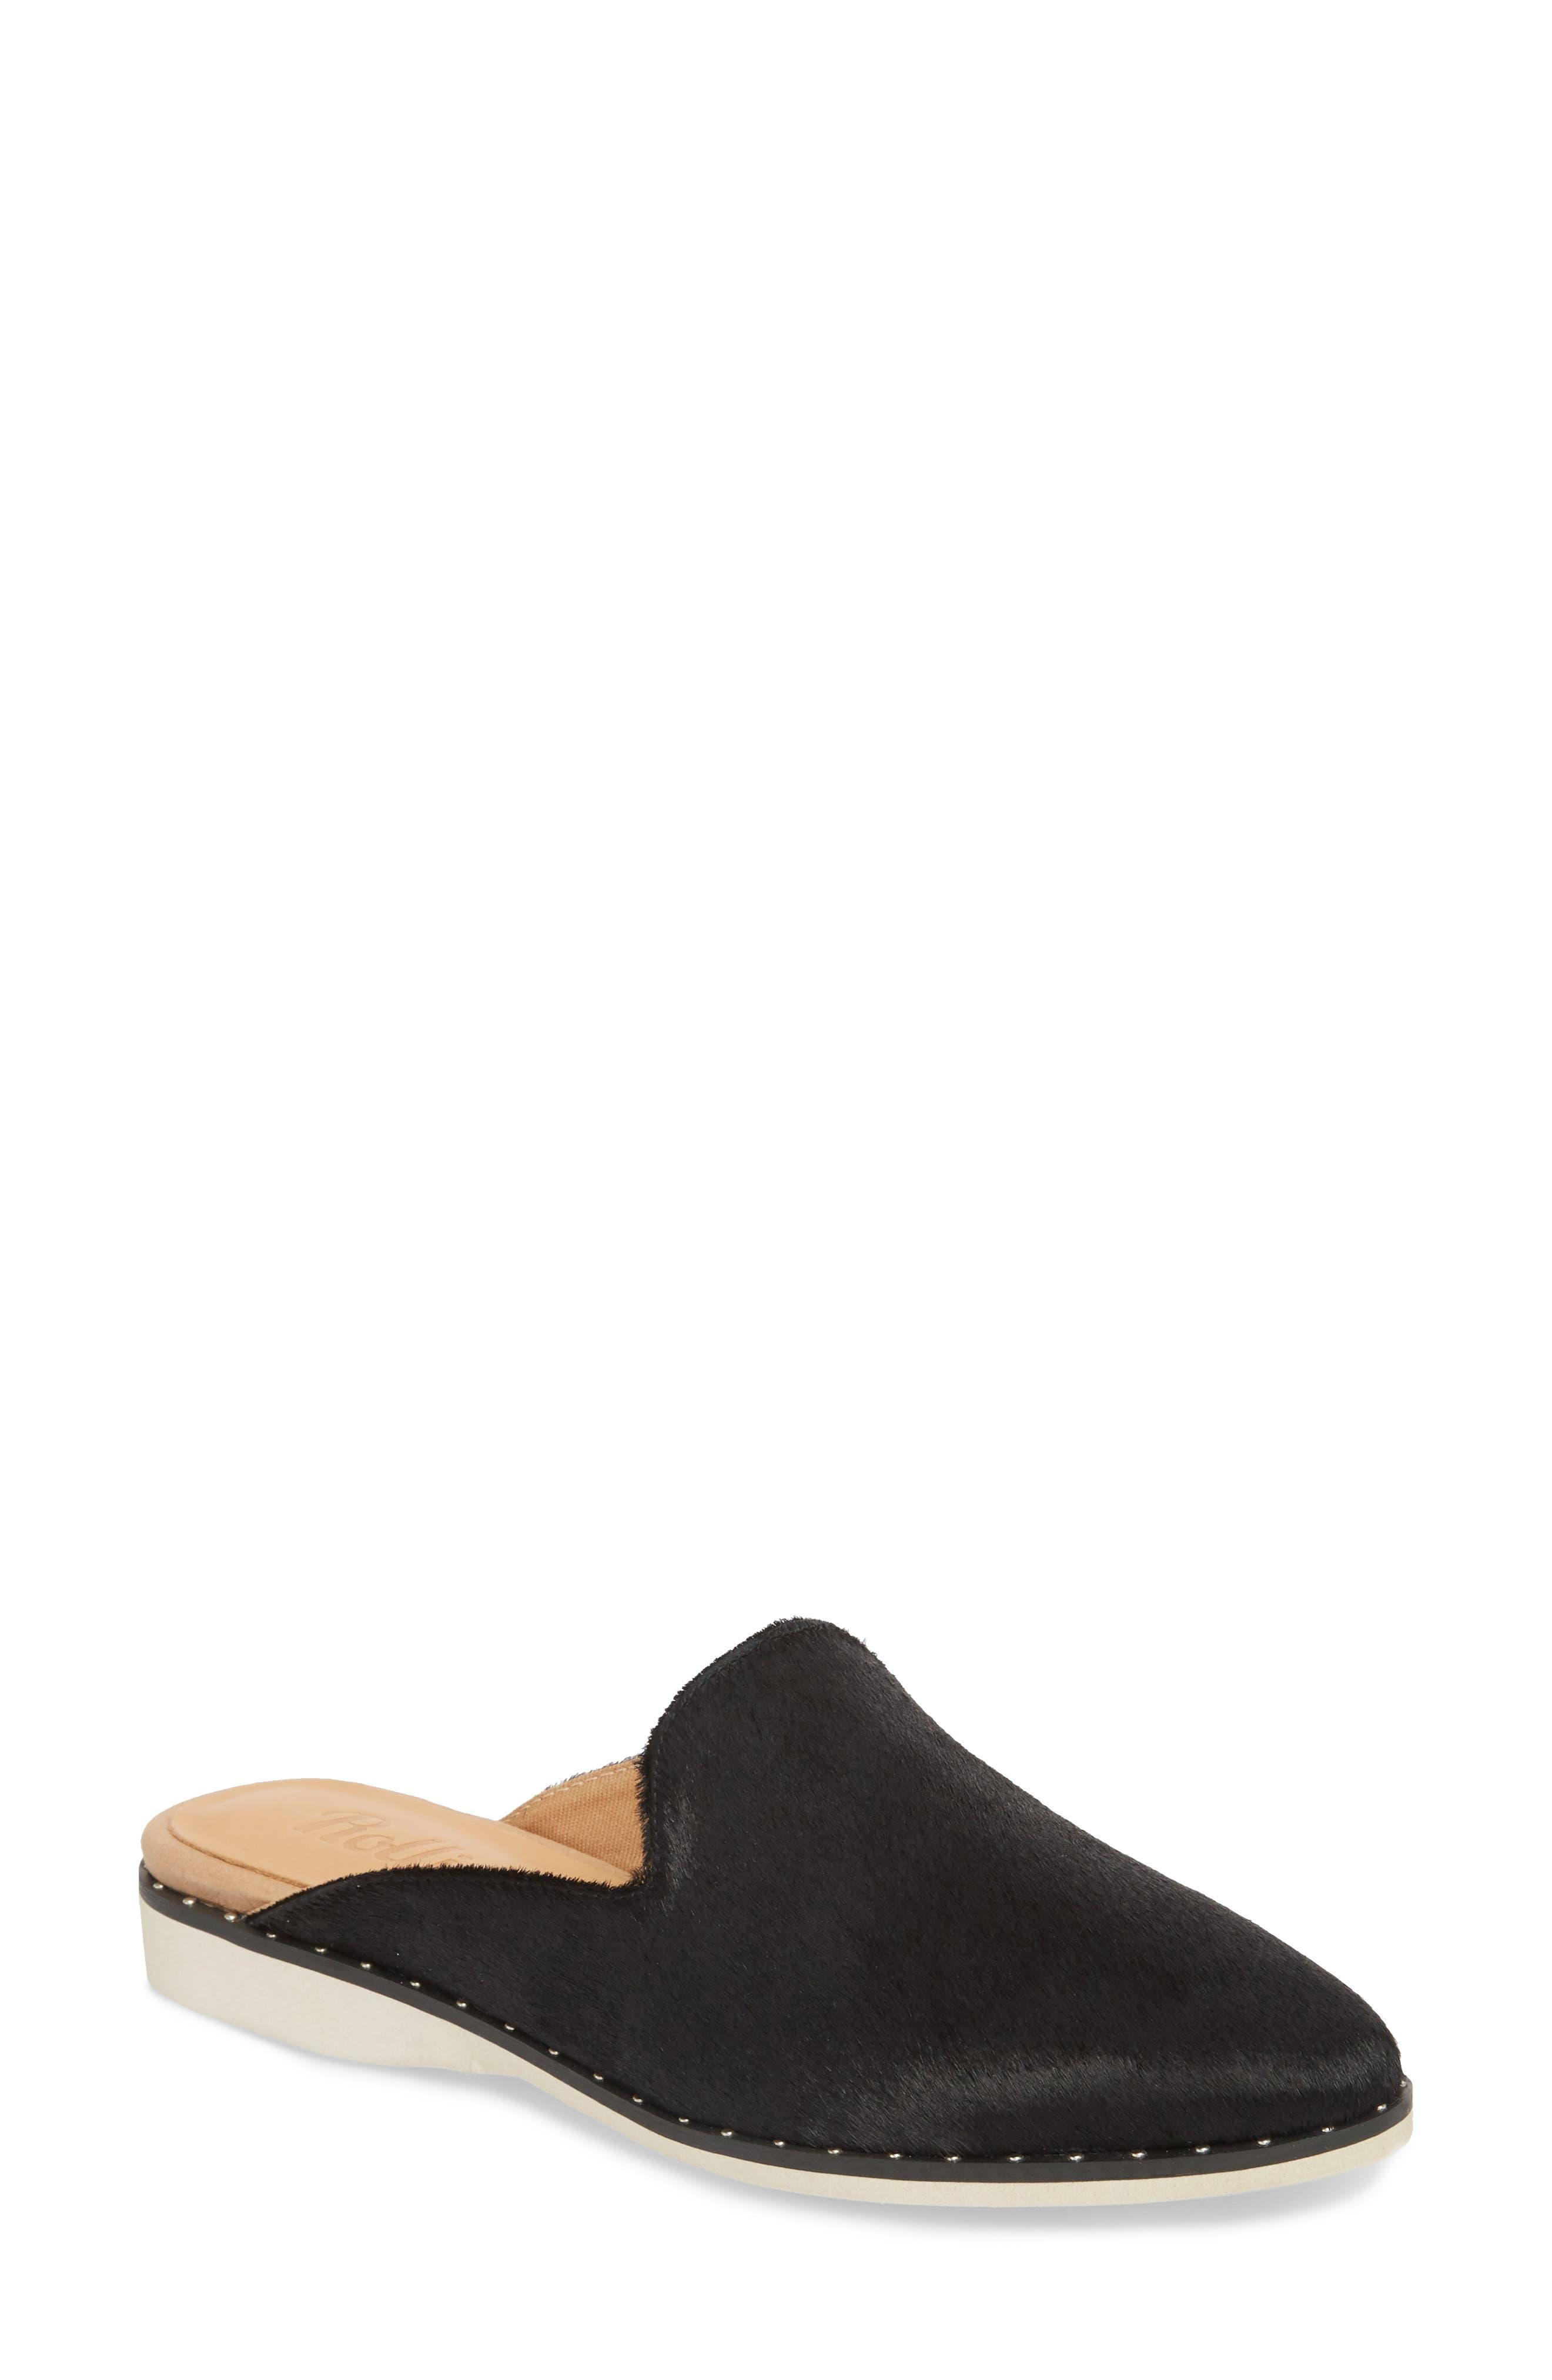 Madison Studded Genuine Calf Hair Loafer Mule,                             Main thumbnail 1, color,                             Black Calf Hair